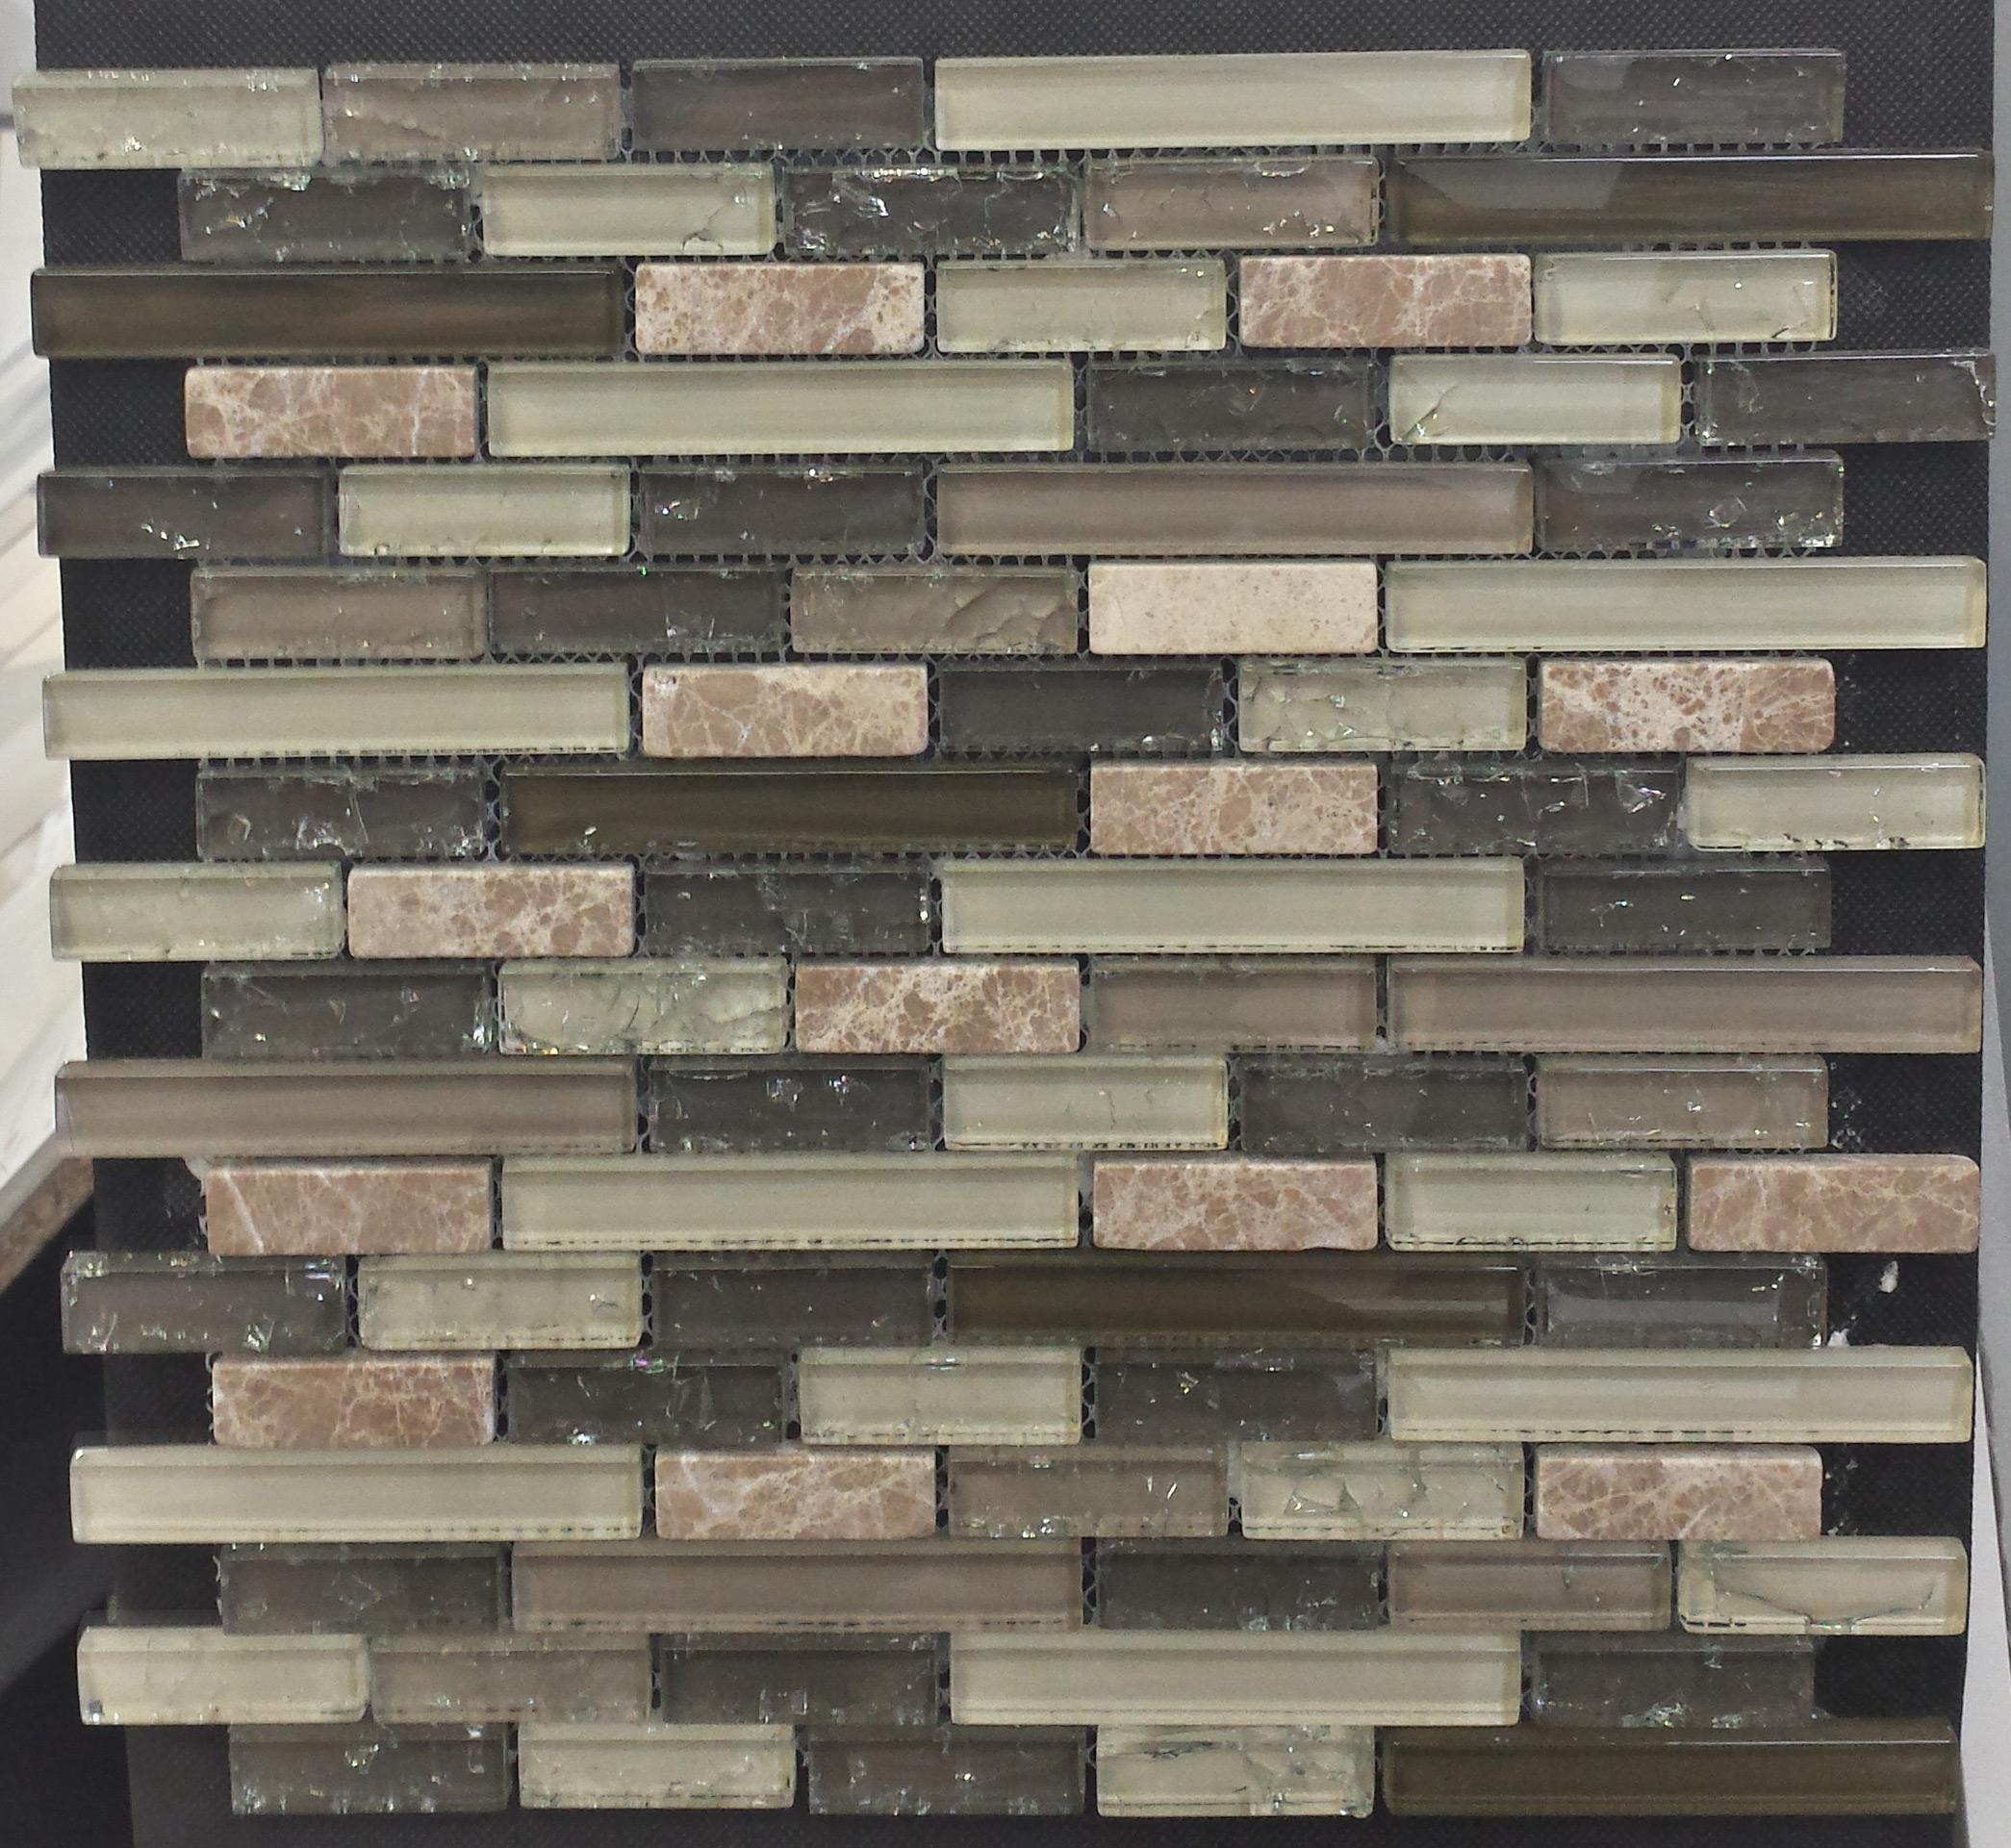 Cinque Glana Anthrazit/Braun be-PMLK251 Mosaik 30x30